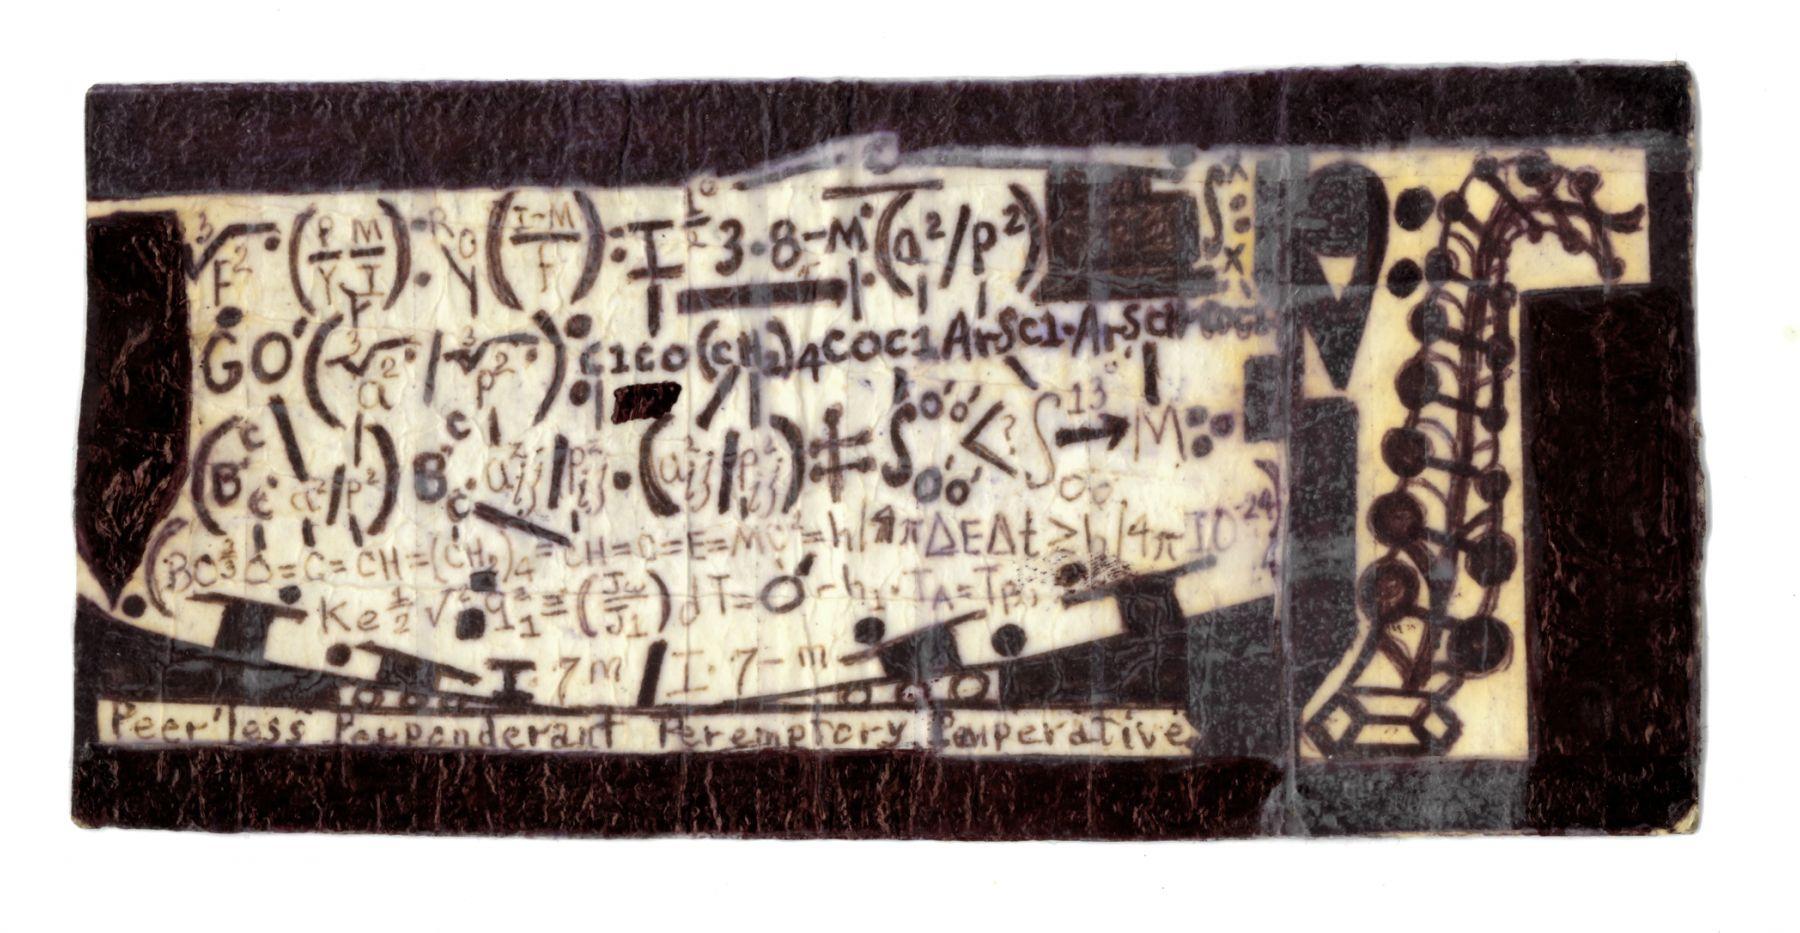 Arieledesprite Nyanza,n.d., Ballpoint pen on paper with Scotch tape